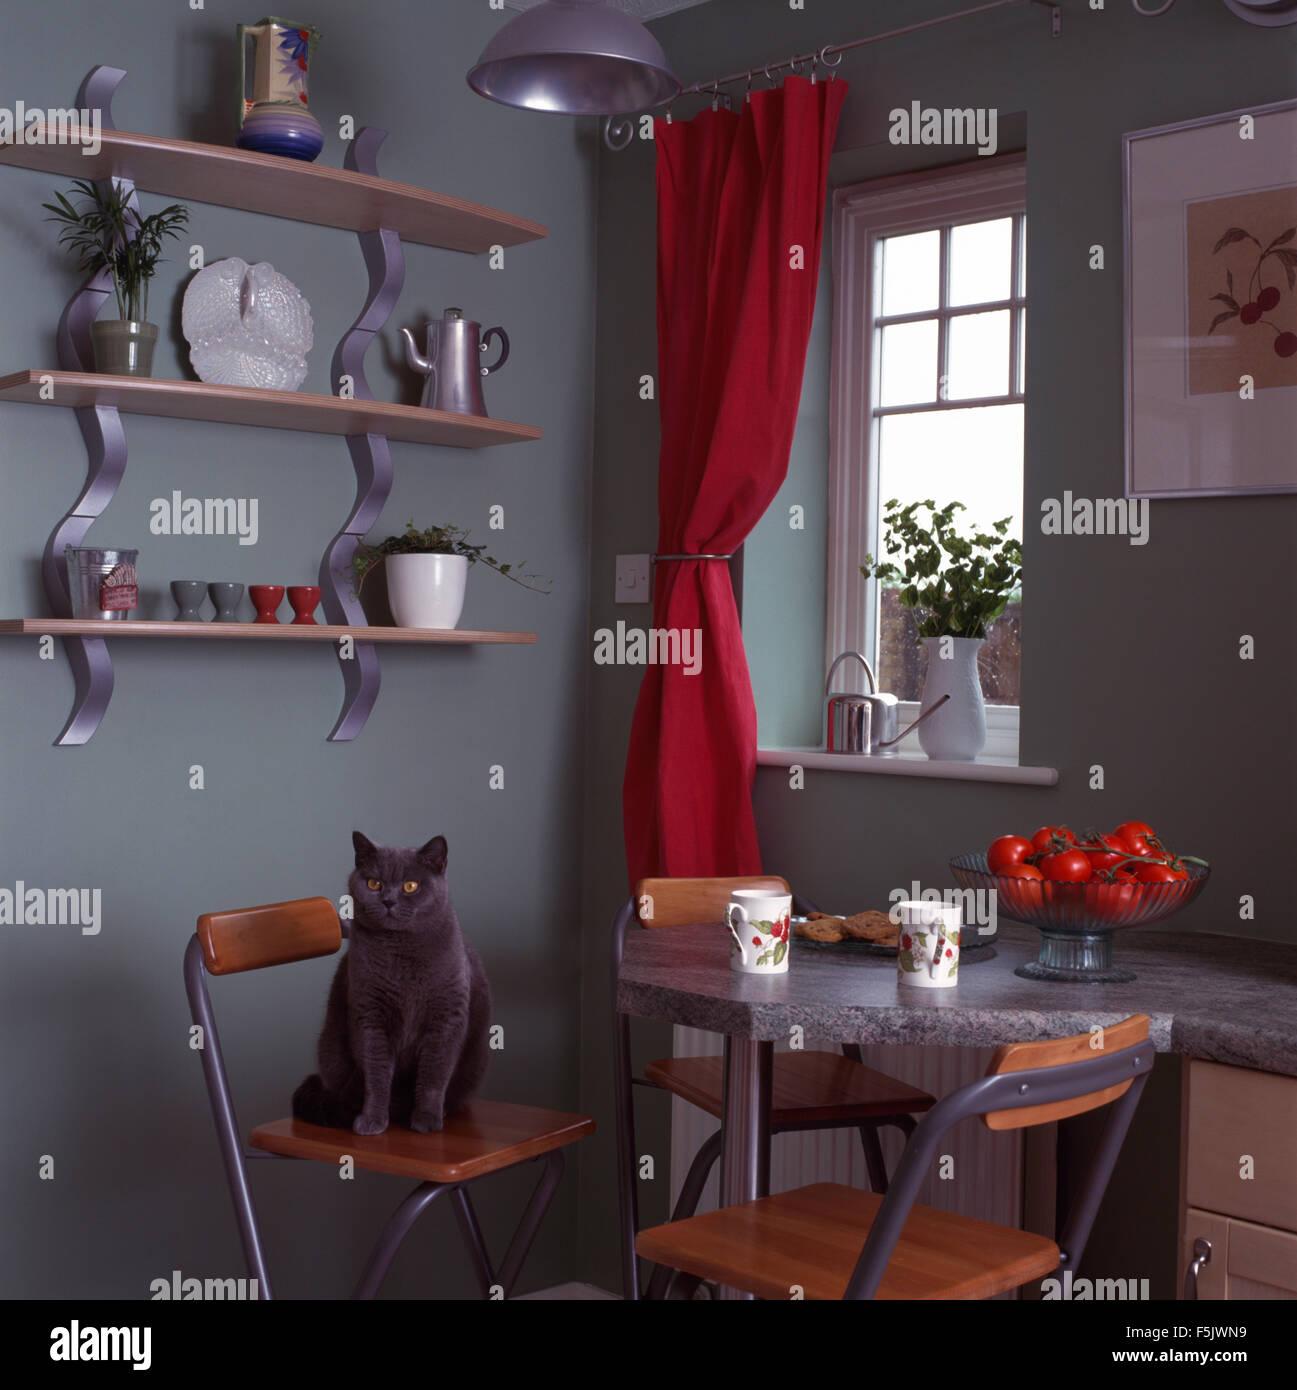 Grey cat sitting on stool at breakfast bar in nineties kitchen